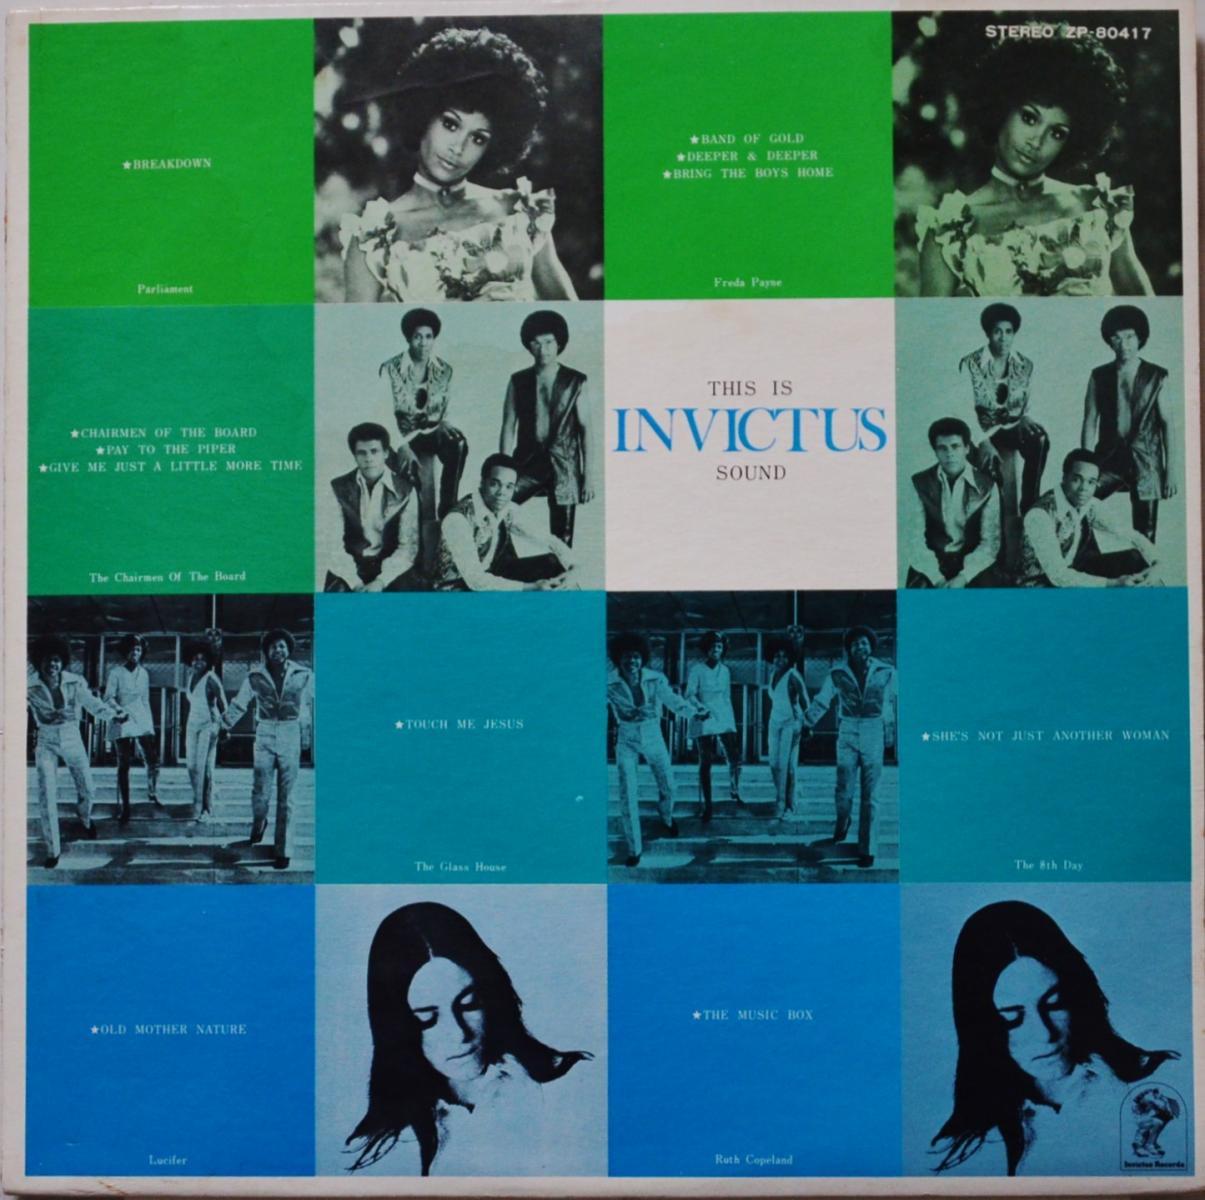 V.A. (FREDA PAYNE,LUCIFER...) / これがインビクタス・サウンド!! / THIS IS INVICTUS SOUND (LP)